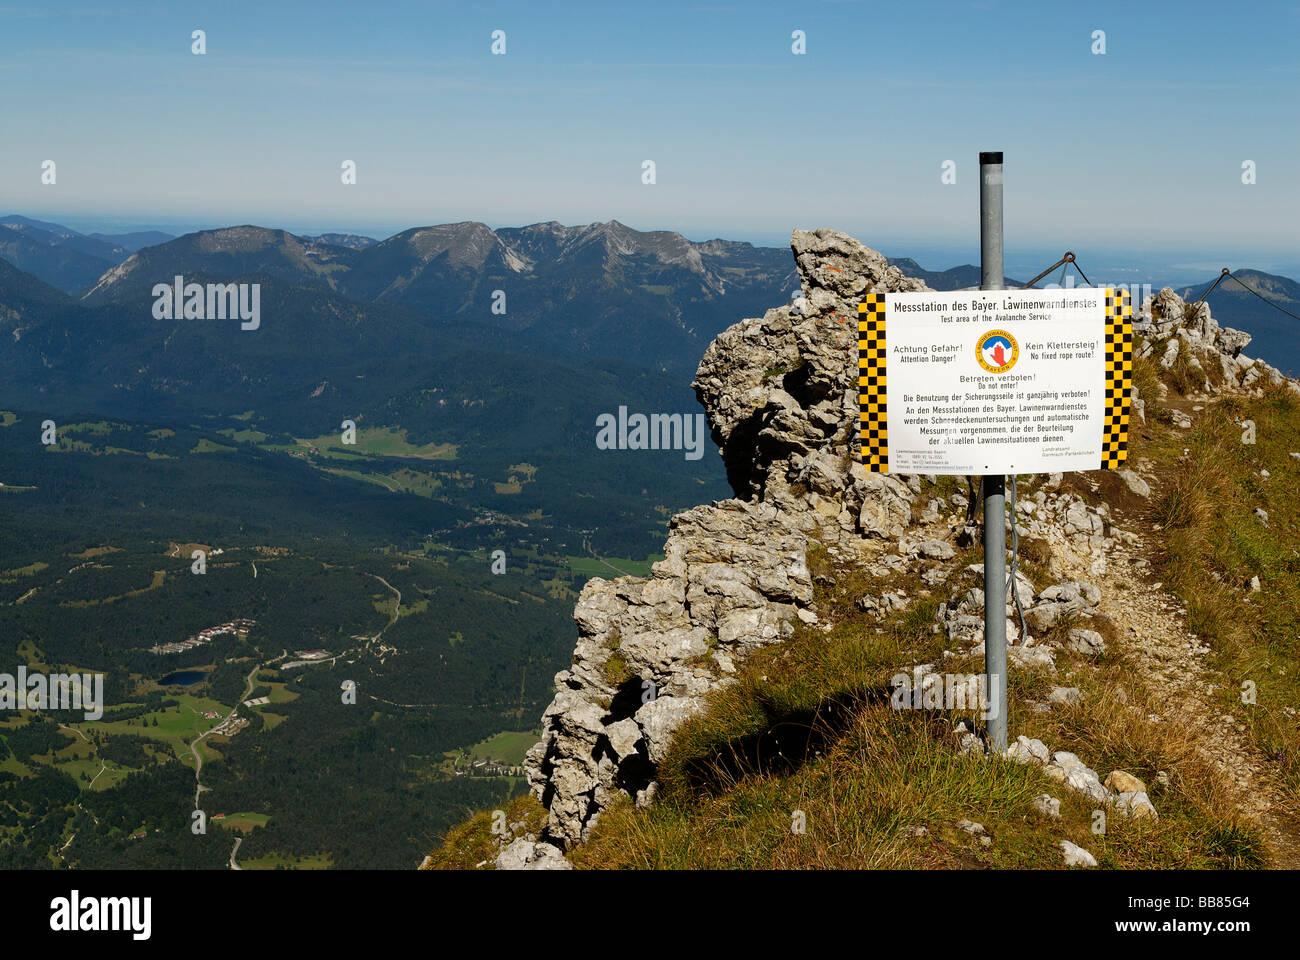 Avalanche messing area, Karwendel Nature Park, on the summit of Mt Karwendel, near Mittenwald, Upper Bavaria, Germany, - Stock Image